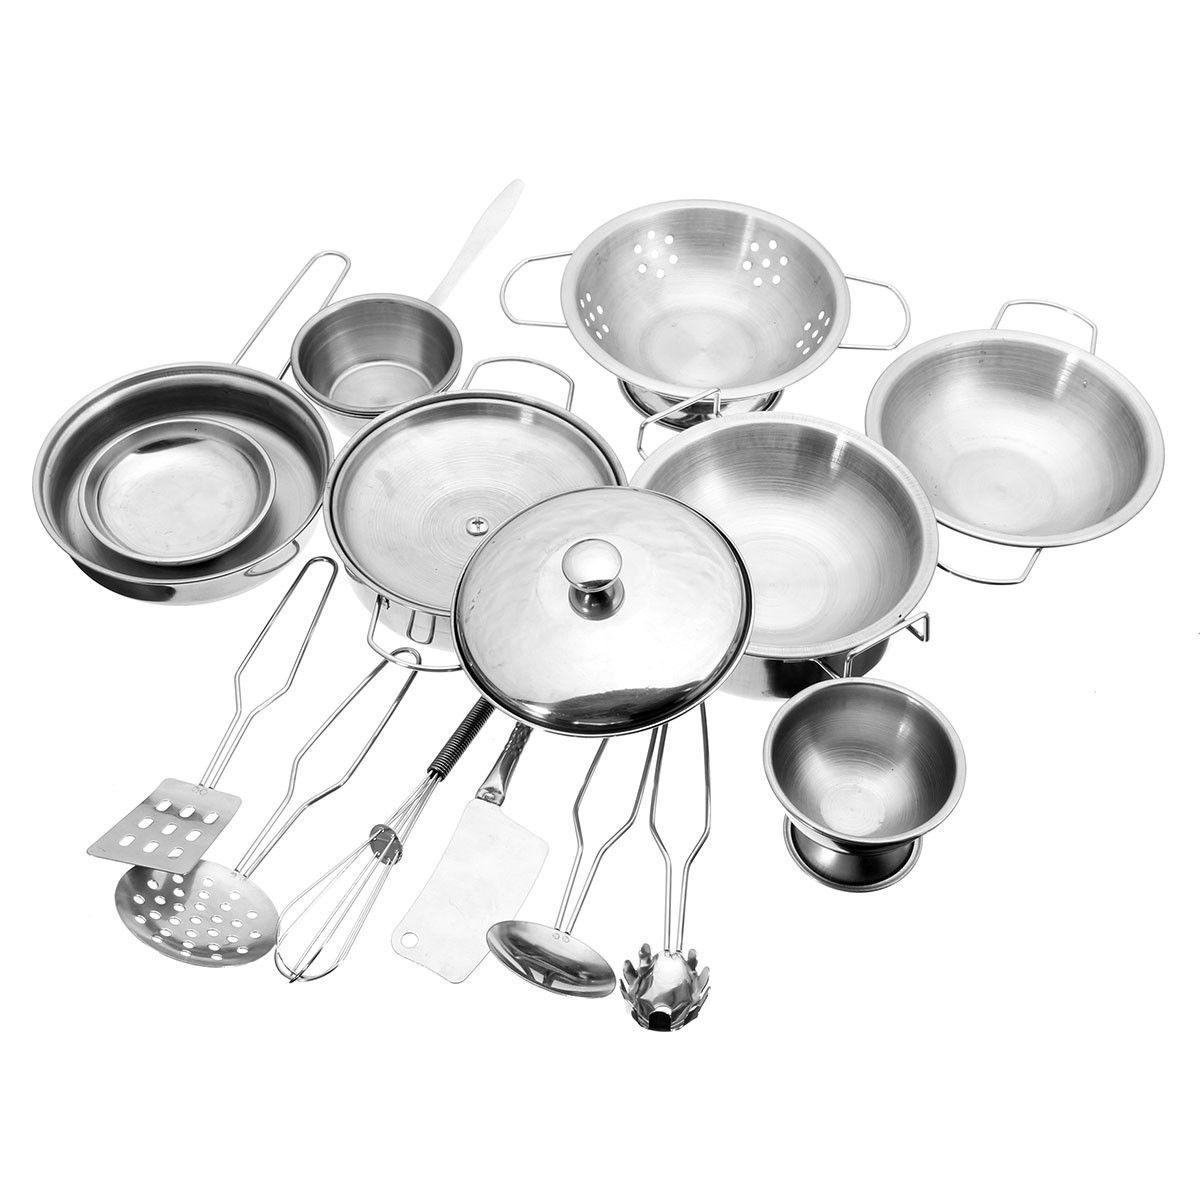 Stainless Steel Kitchen Cooking Utensils Pots Pans